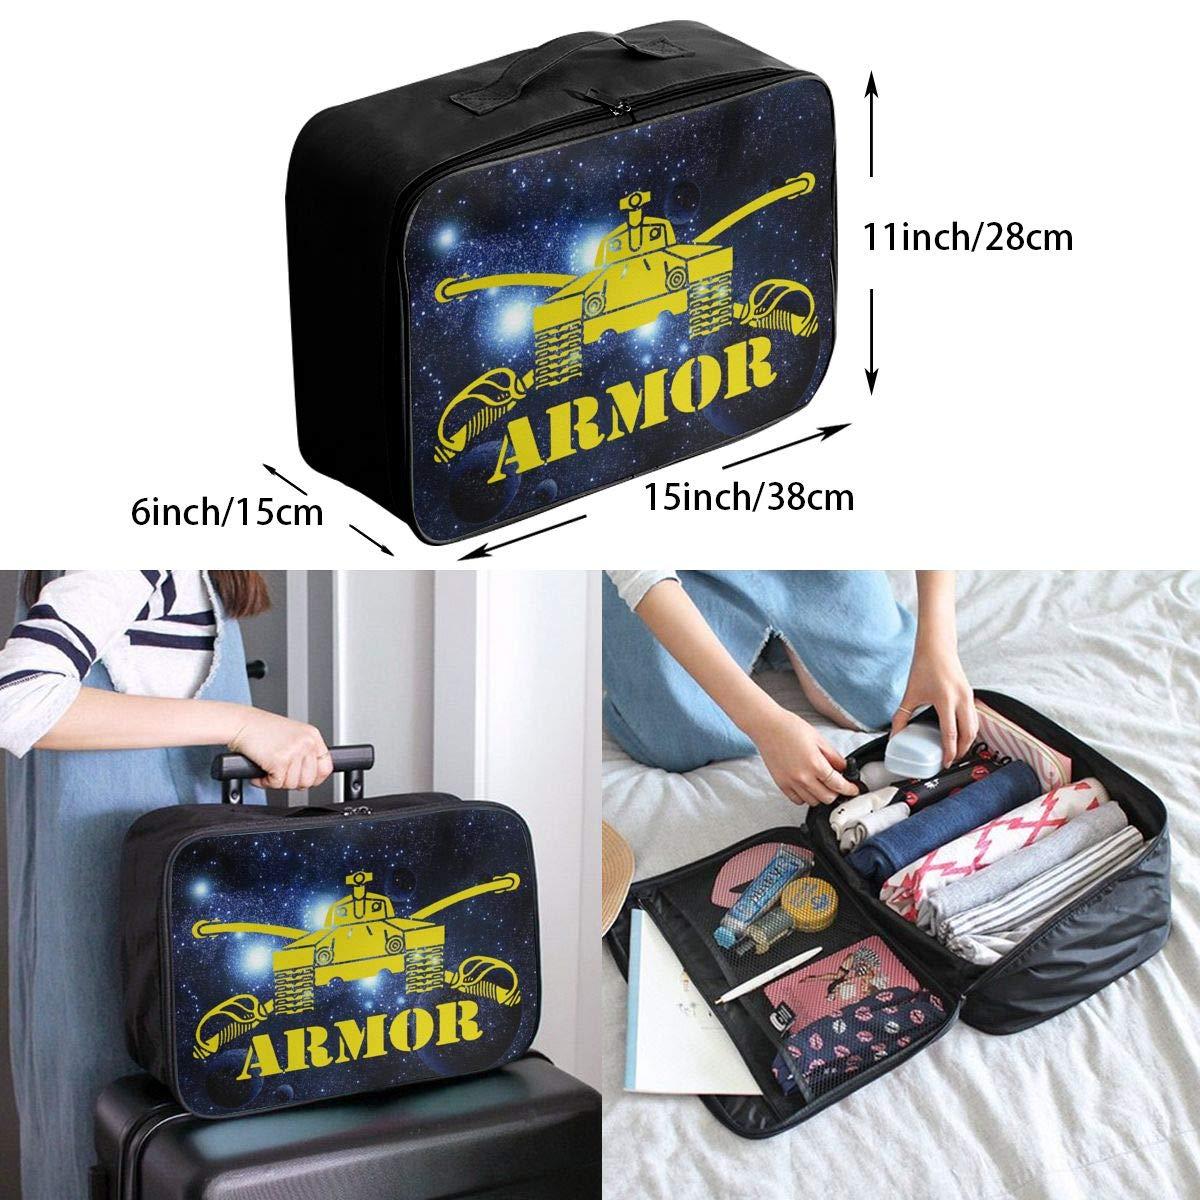 Unisex Travel Duffel Bag Waterproof Fashion Lightweight Large Capacity Portable Luggage Bag Army Armor